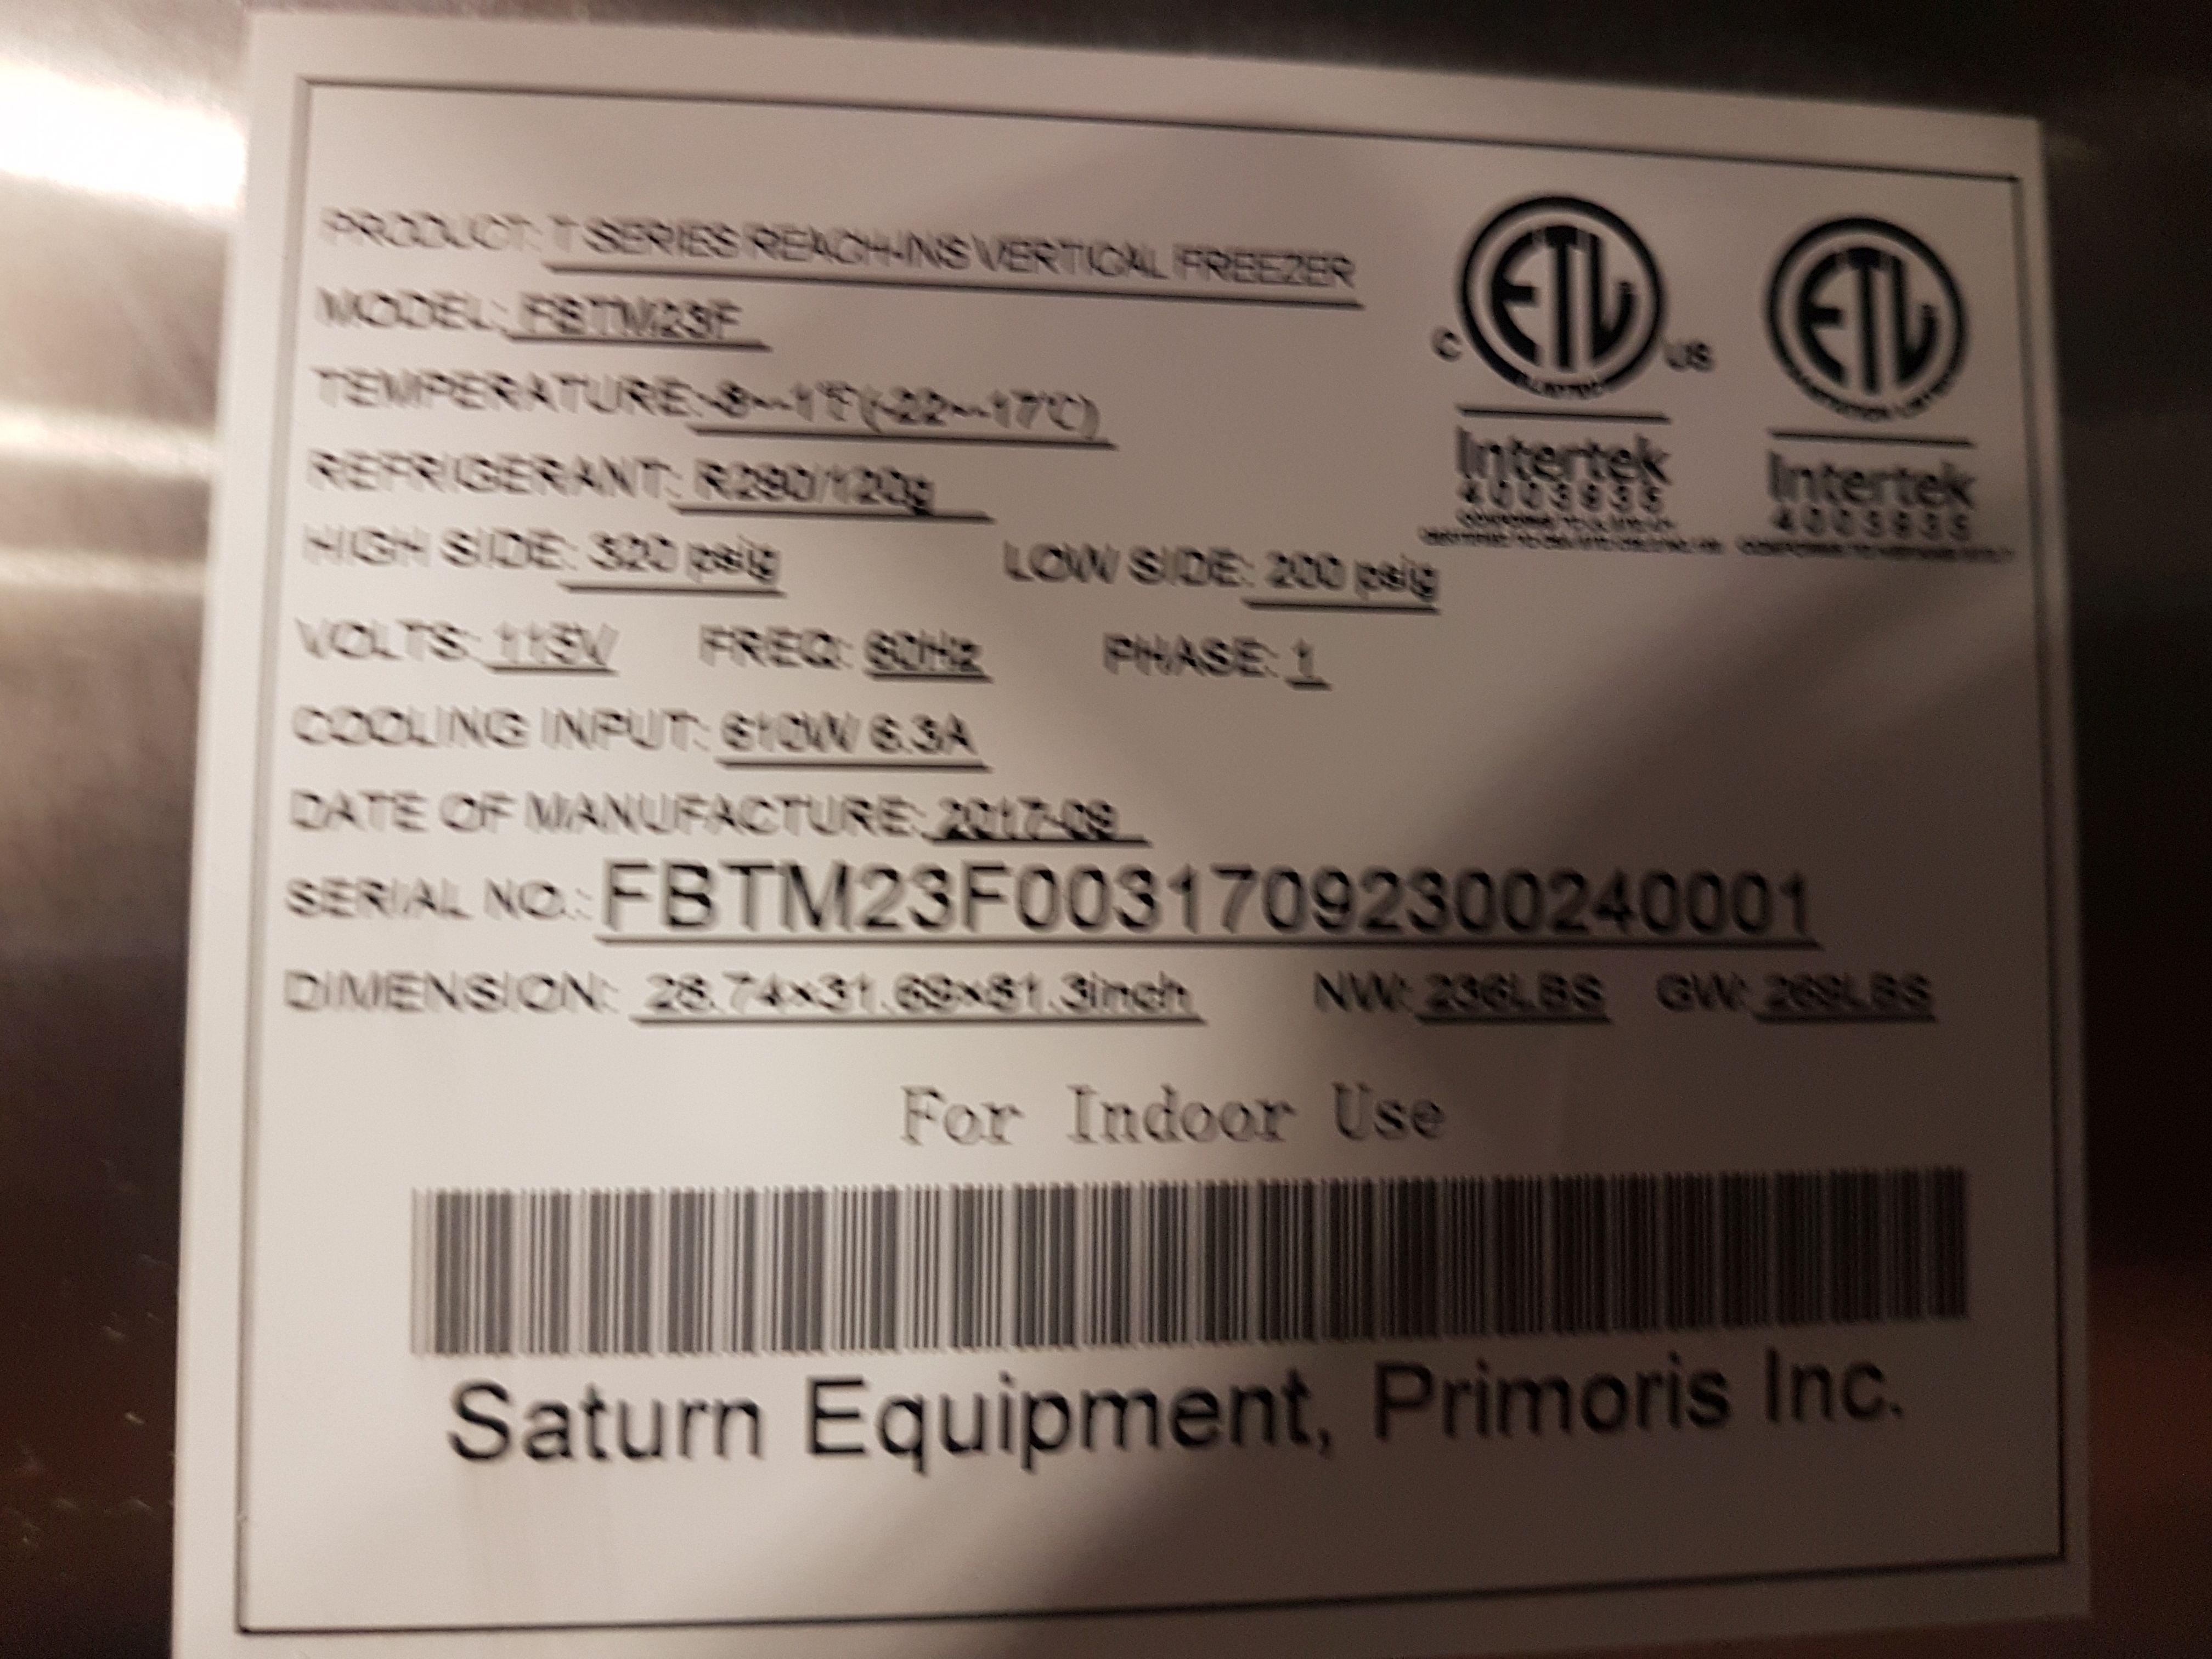 Lot 22 - Saturn Stainless Single Door Freezer - Model FBTM23F